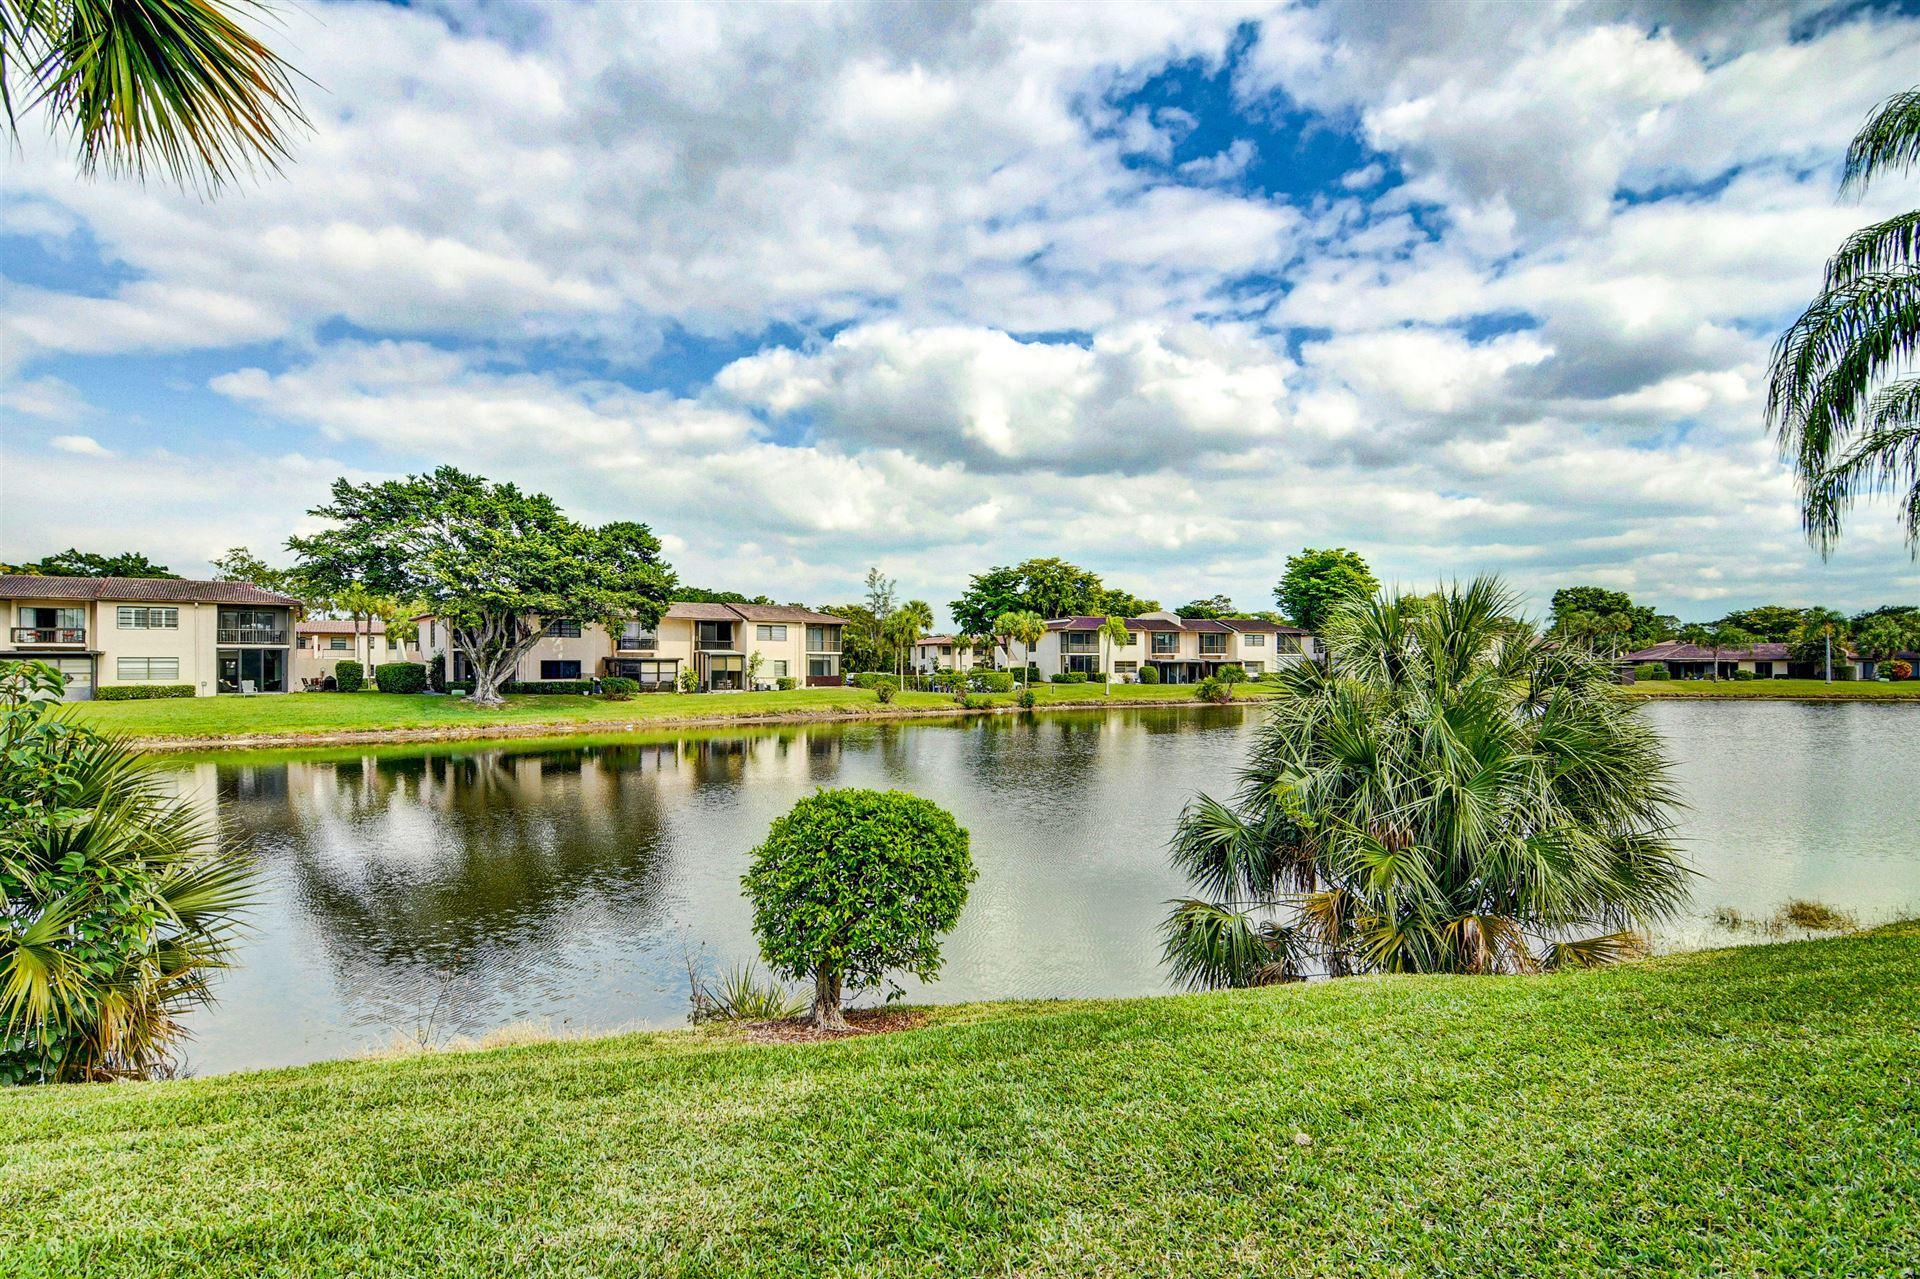 21386 Juego G Circle #10-G, Boca Raton, FL 33433 - MLS#: RX-10702050